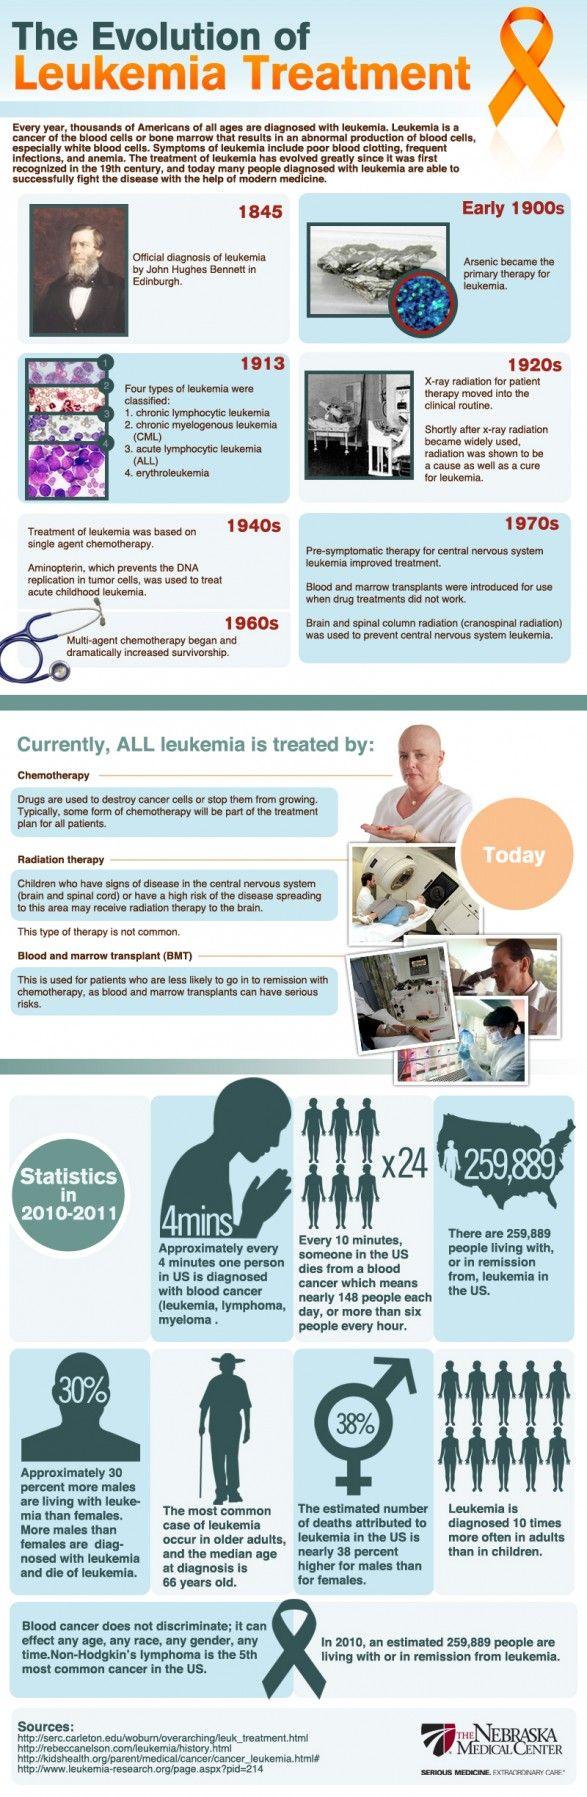 The evolution of Leukemia Treatment